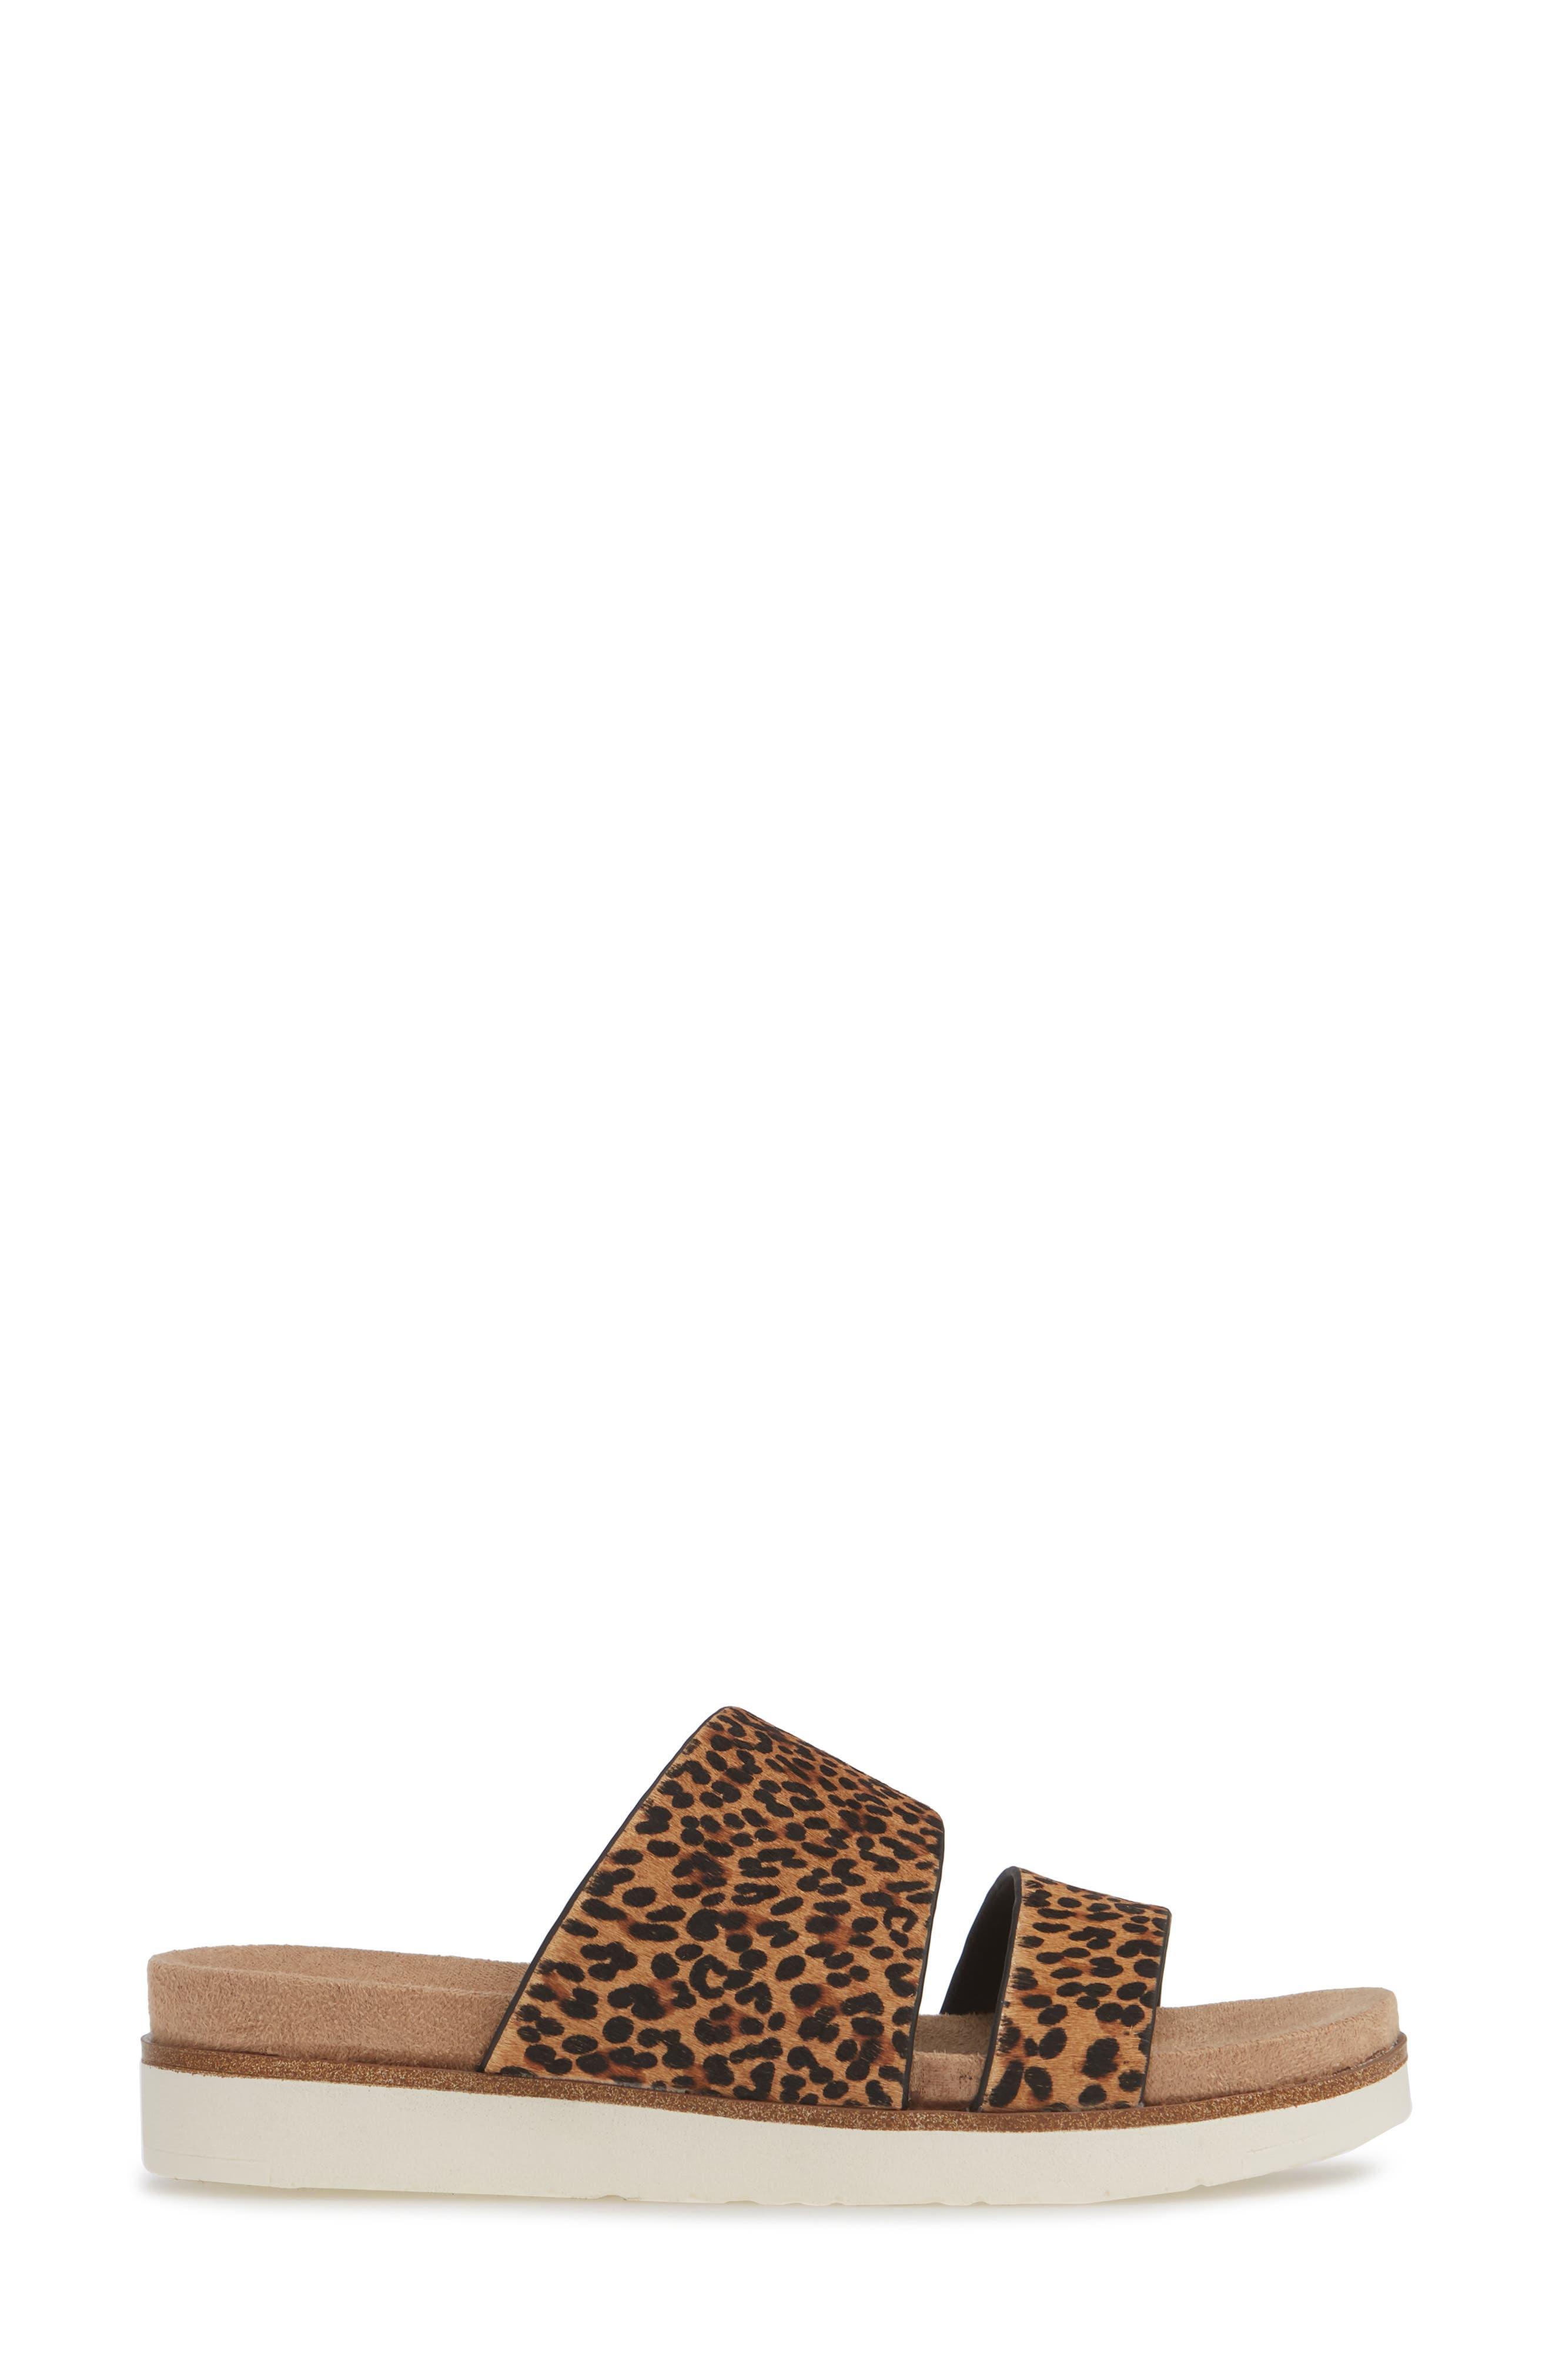 ,                             Danesha Genuine Calf Hair Slide Sandal,                             Alternate thumbnail 4, color,                             LEOPARD PRINT CALF HAIR